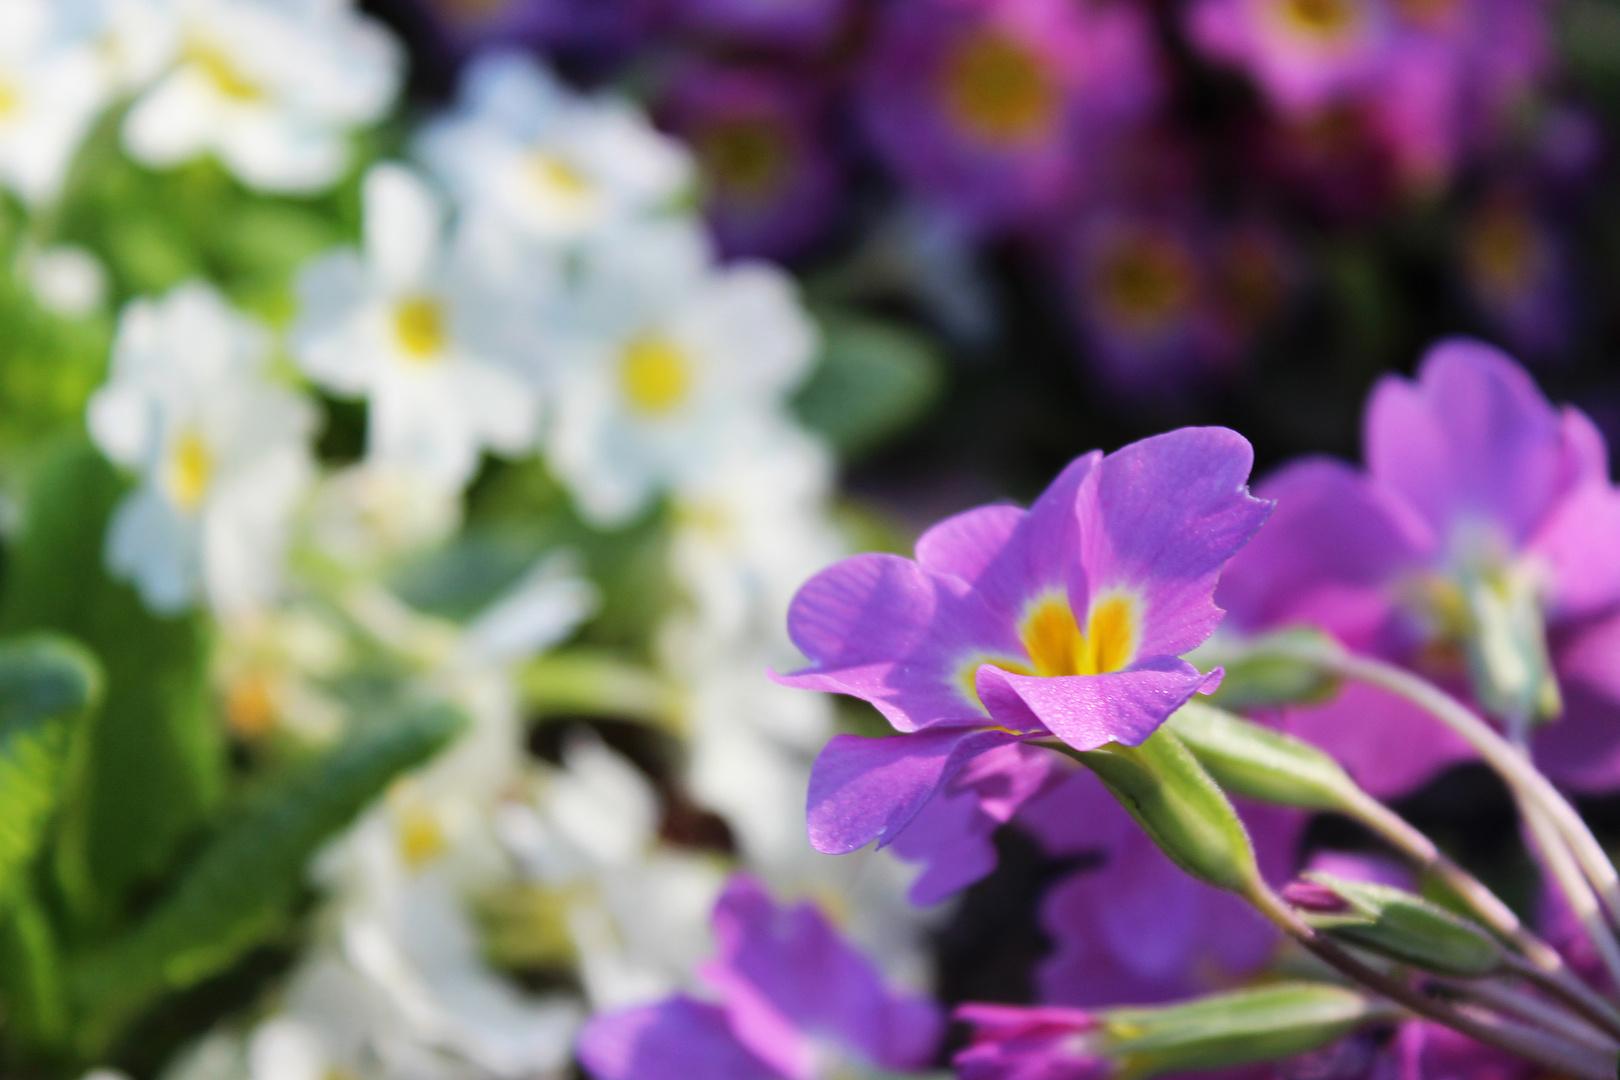 Gärten der Welt - Blütenpracht